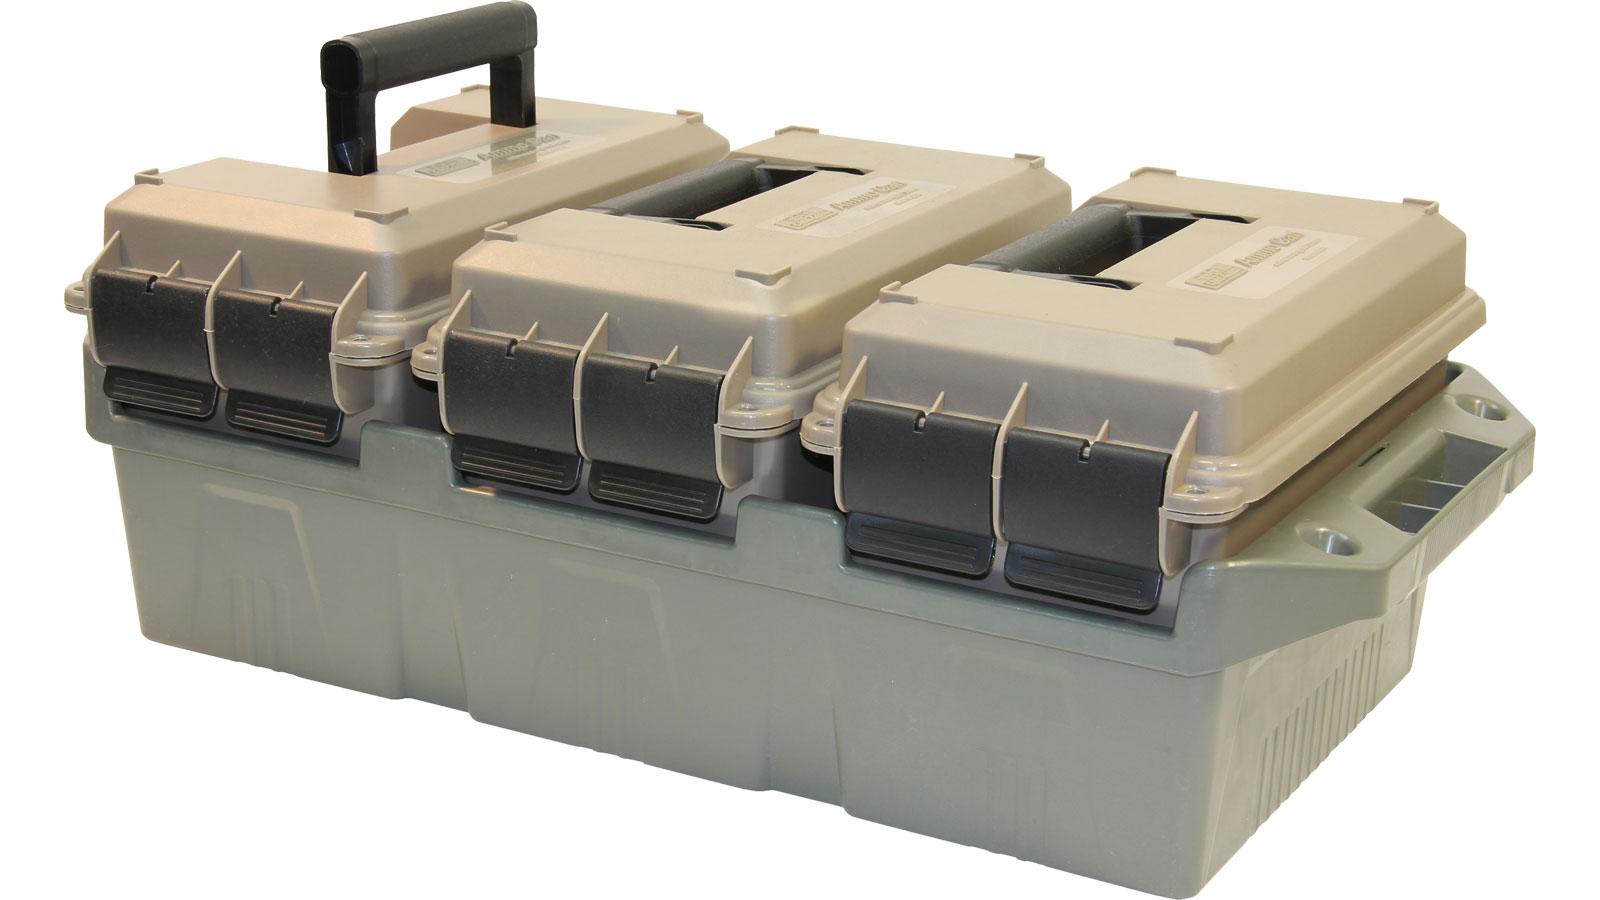 MTM AC3C 3-Can Ammo Crate 50 Cal Dark Earth